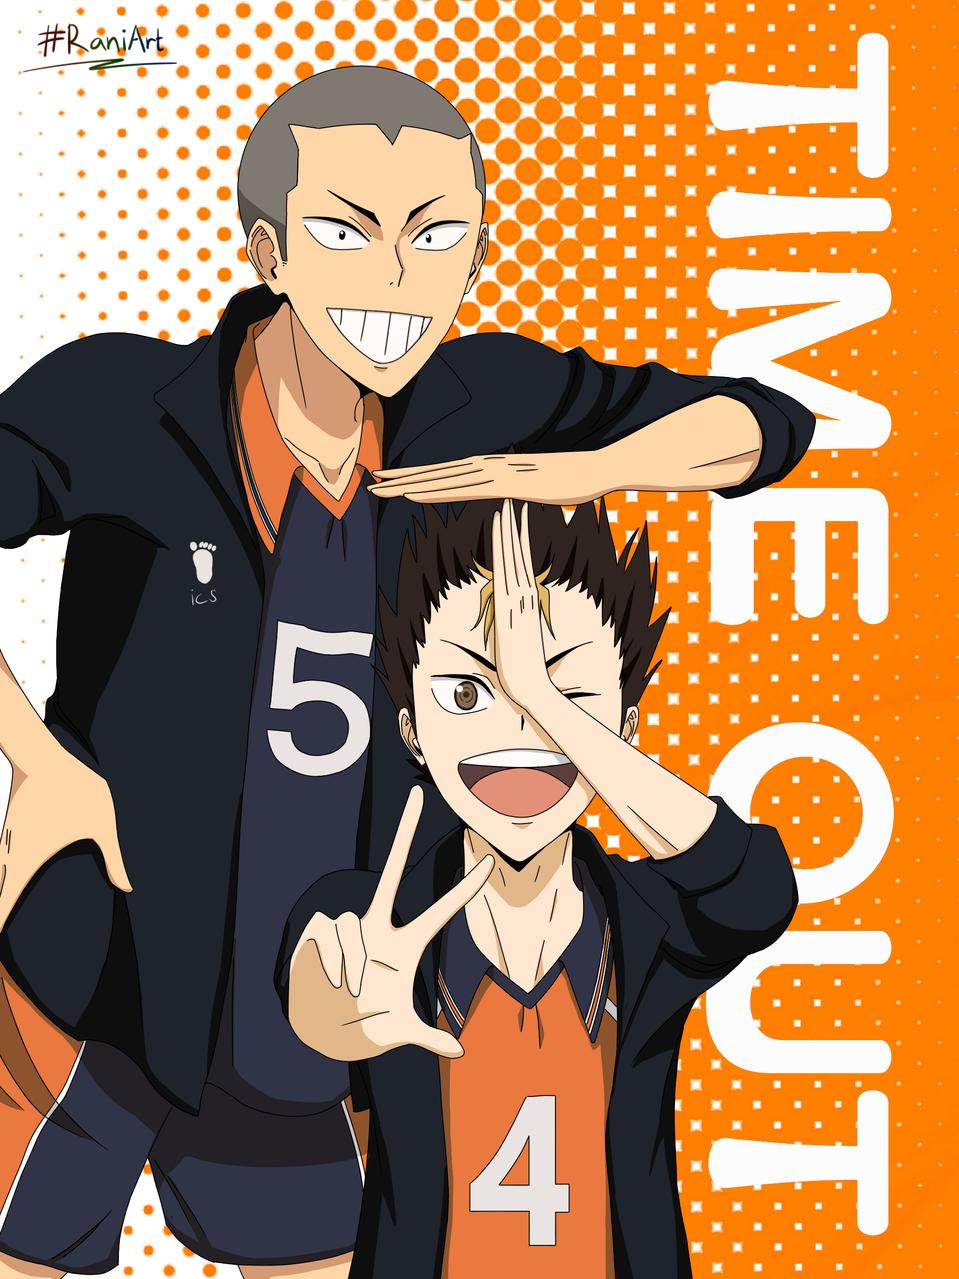 Haikyuu! Tanaka and Nishinoya Illust of Hali Tomorrow medibangpaint fanart timeout nishinoya YūNishinoya Haikyu!! RaniArt tanakaryuunosuke nishinoyayuu